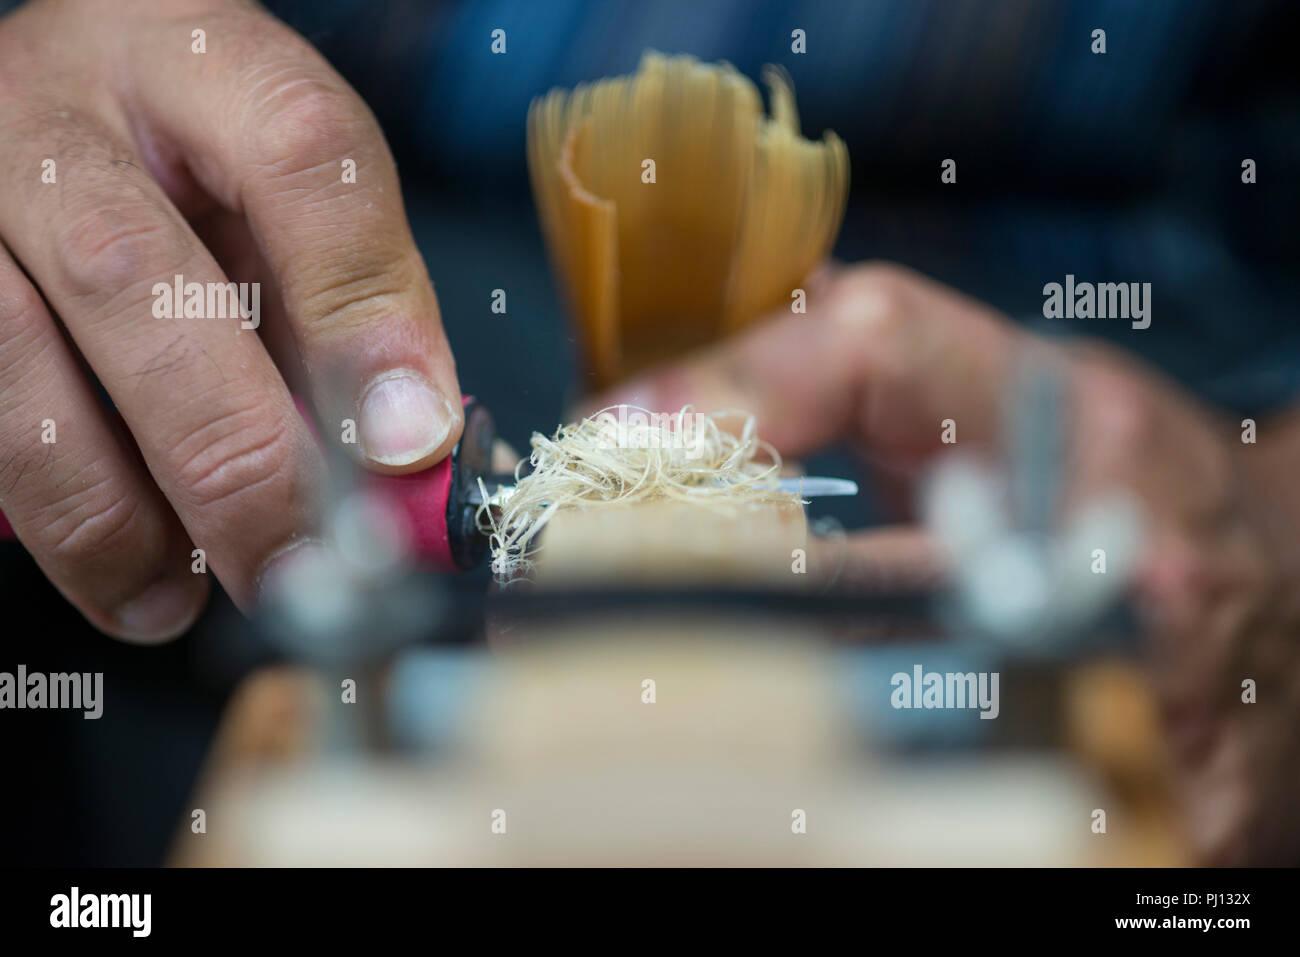 Chasen craftsman Kyosuke Kubo shaves the tines of a Takayama chasen tea whisk inside his family's Chikusendo workshop in Takayama district of  Ikoma C - Stock Image